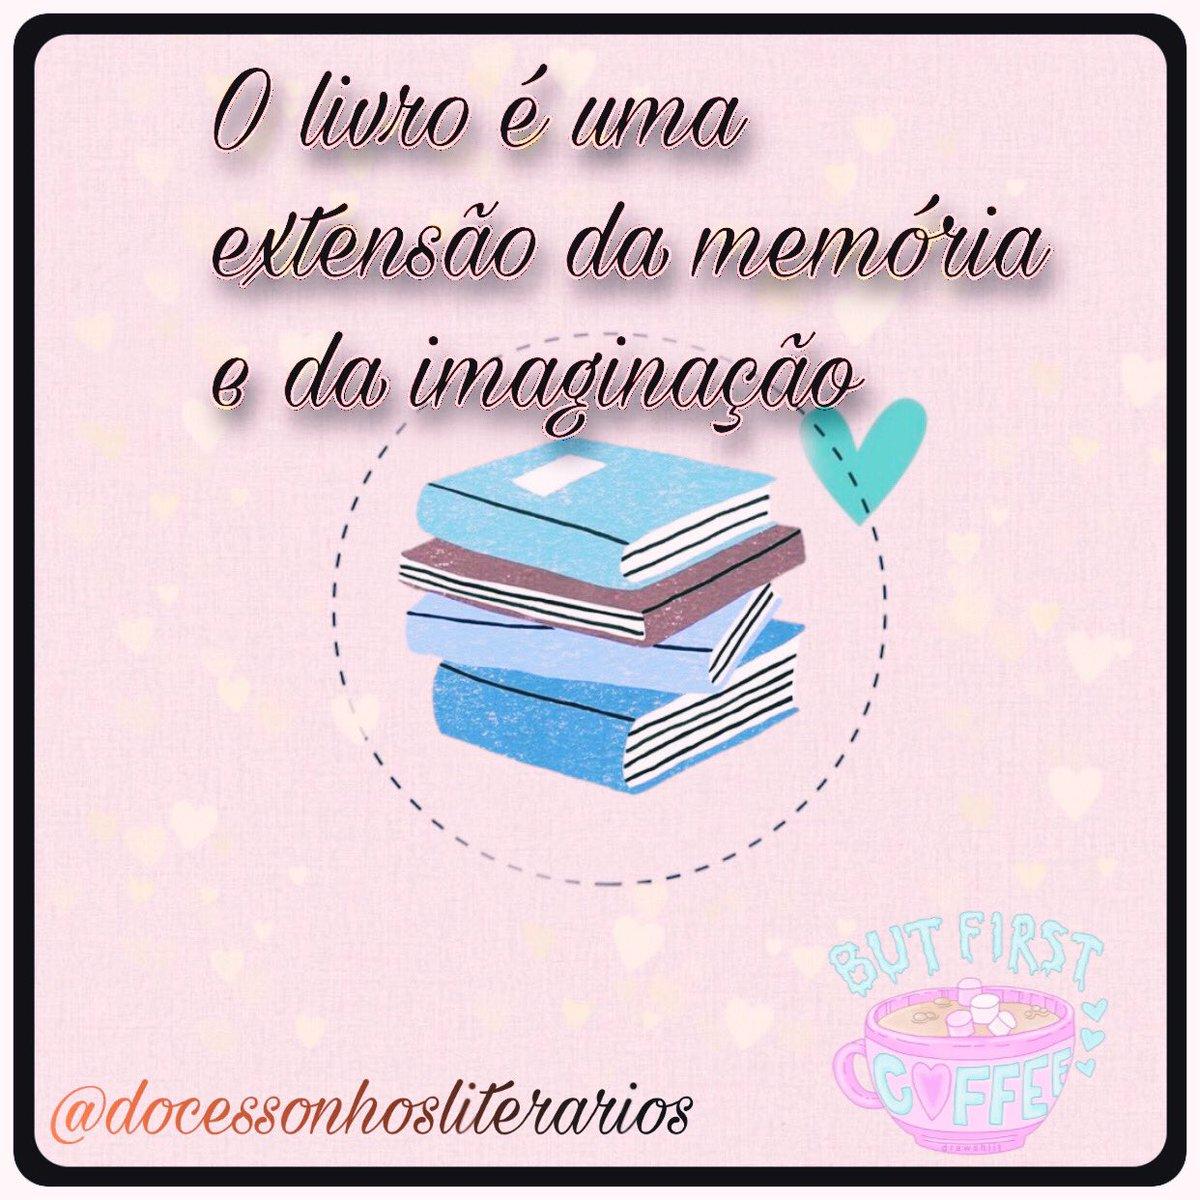 #livros #livro #book #books #bookstagram #instabook #blogliterario #leitura #leituras #blogliterário #bookaholic #booklover #booklovers #bookaddict #bookobsessed #bookblogger #booklove #bookslovepic.twitter.com/1McW0IEWVx